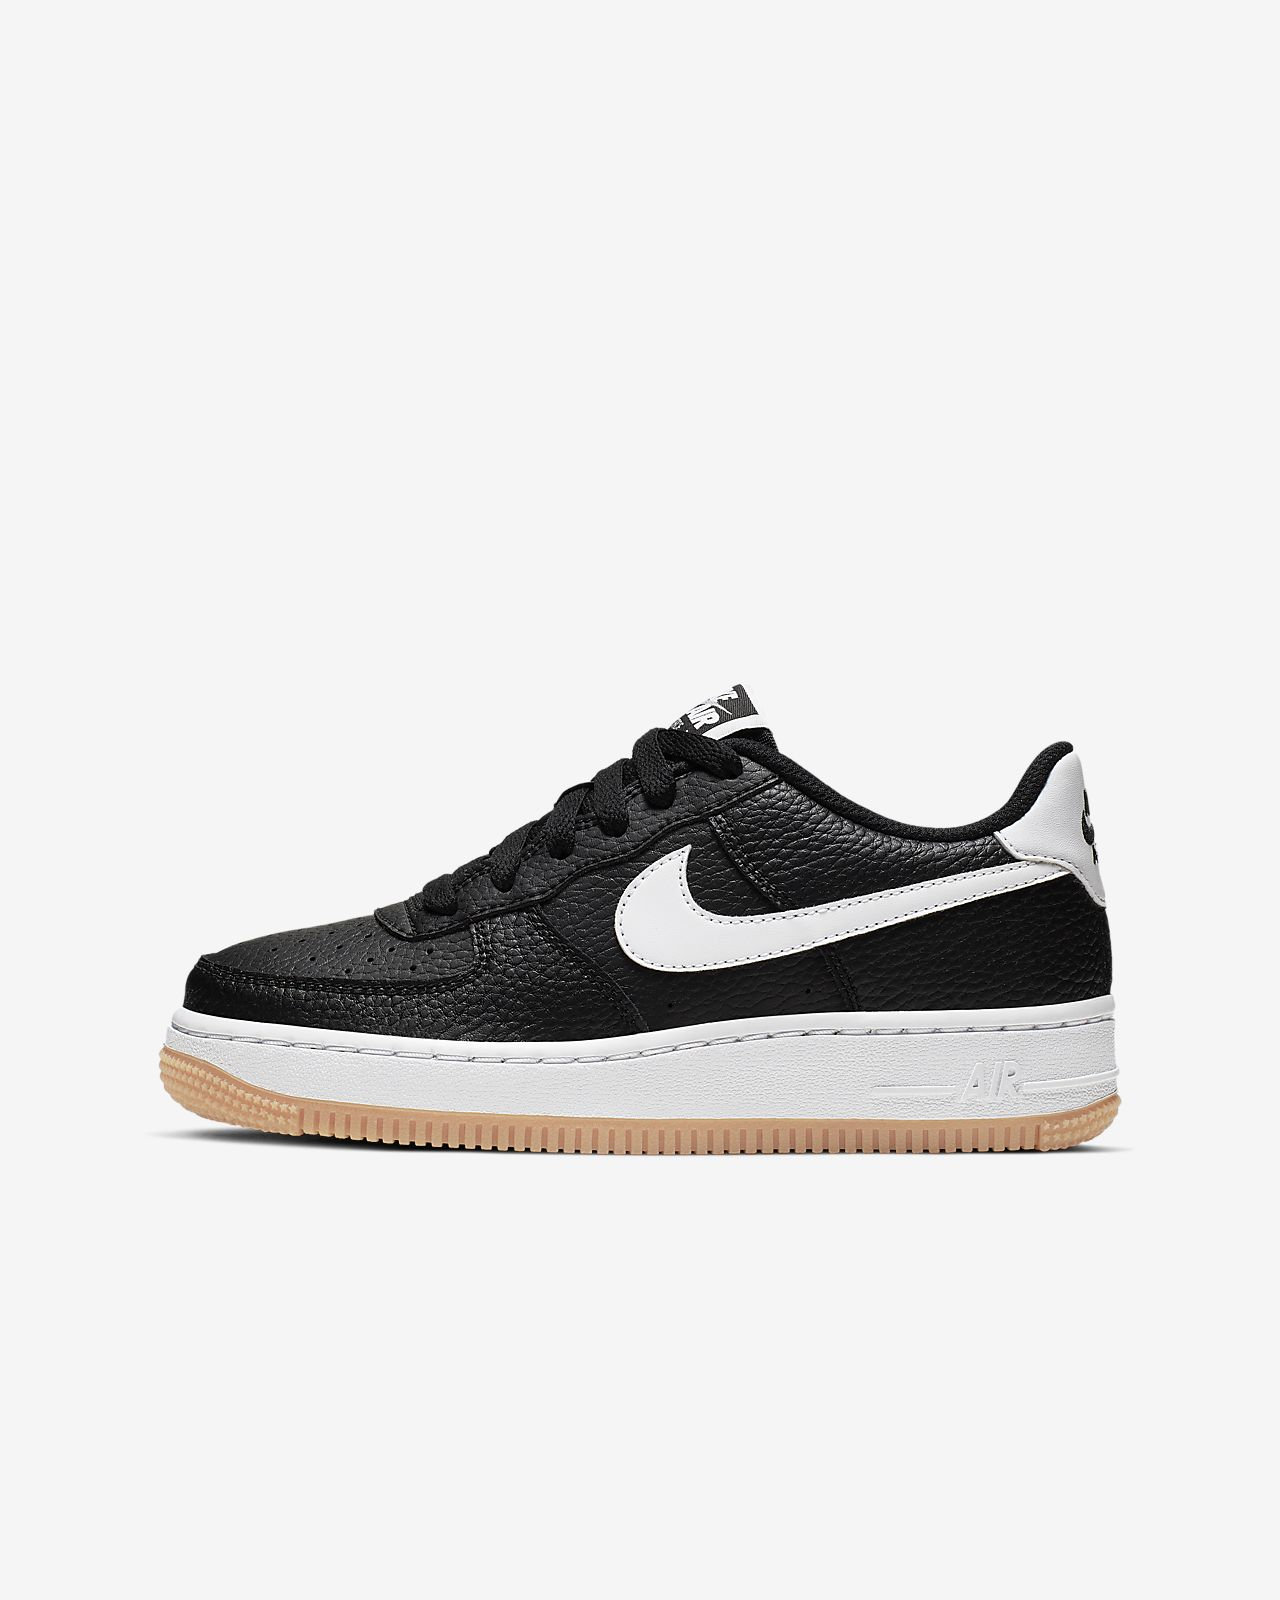 Nike Air Force 1-2 Kinderschoen